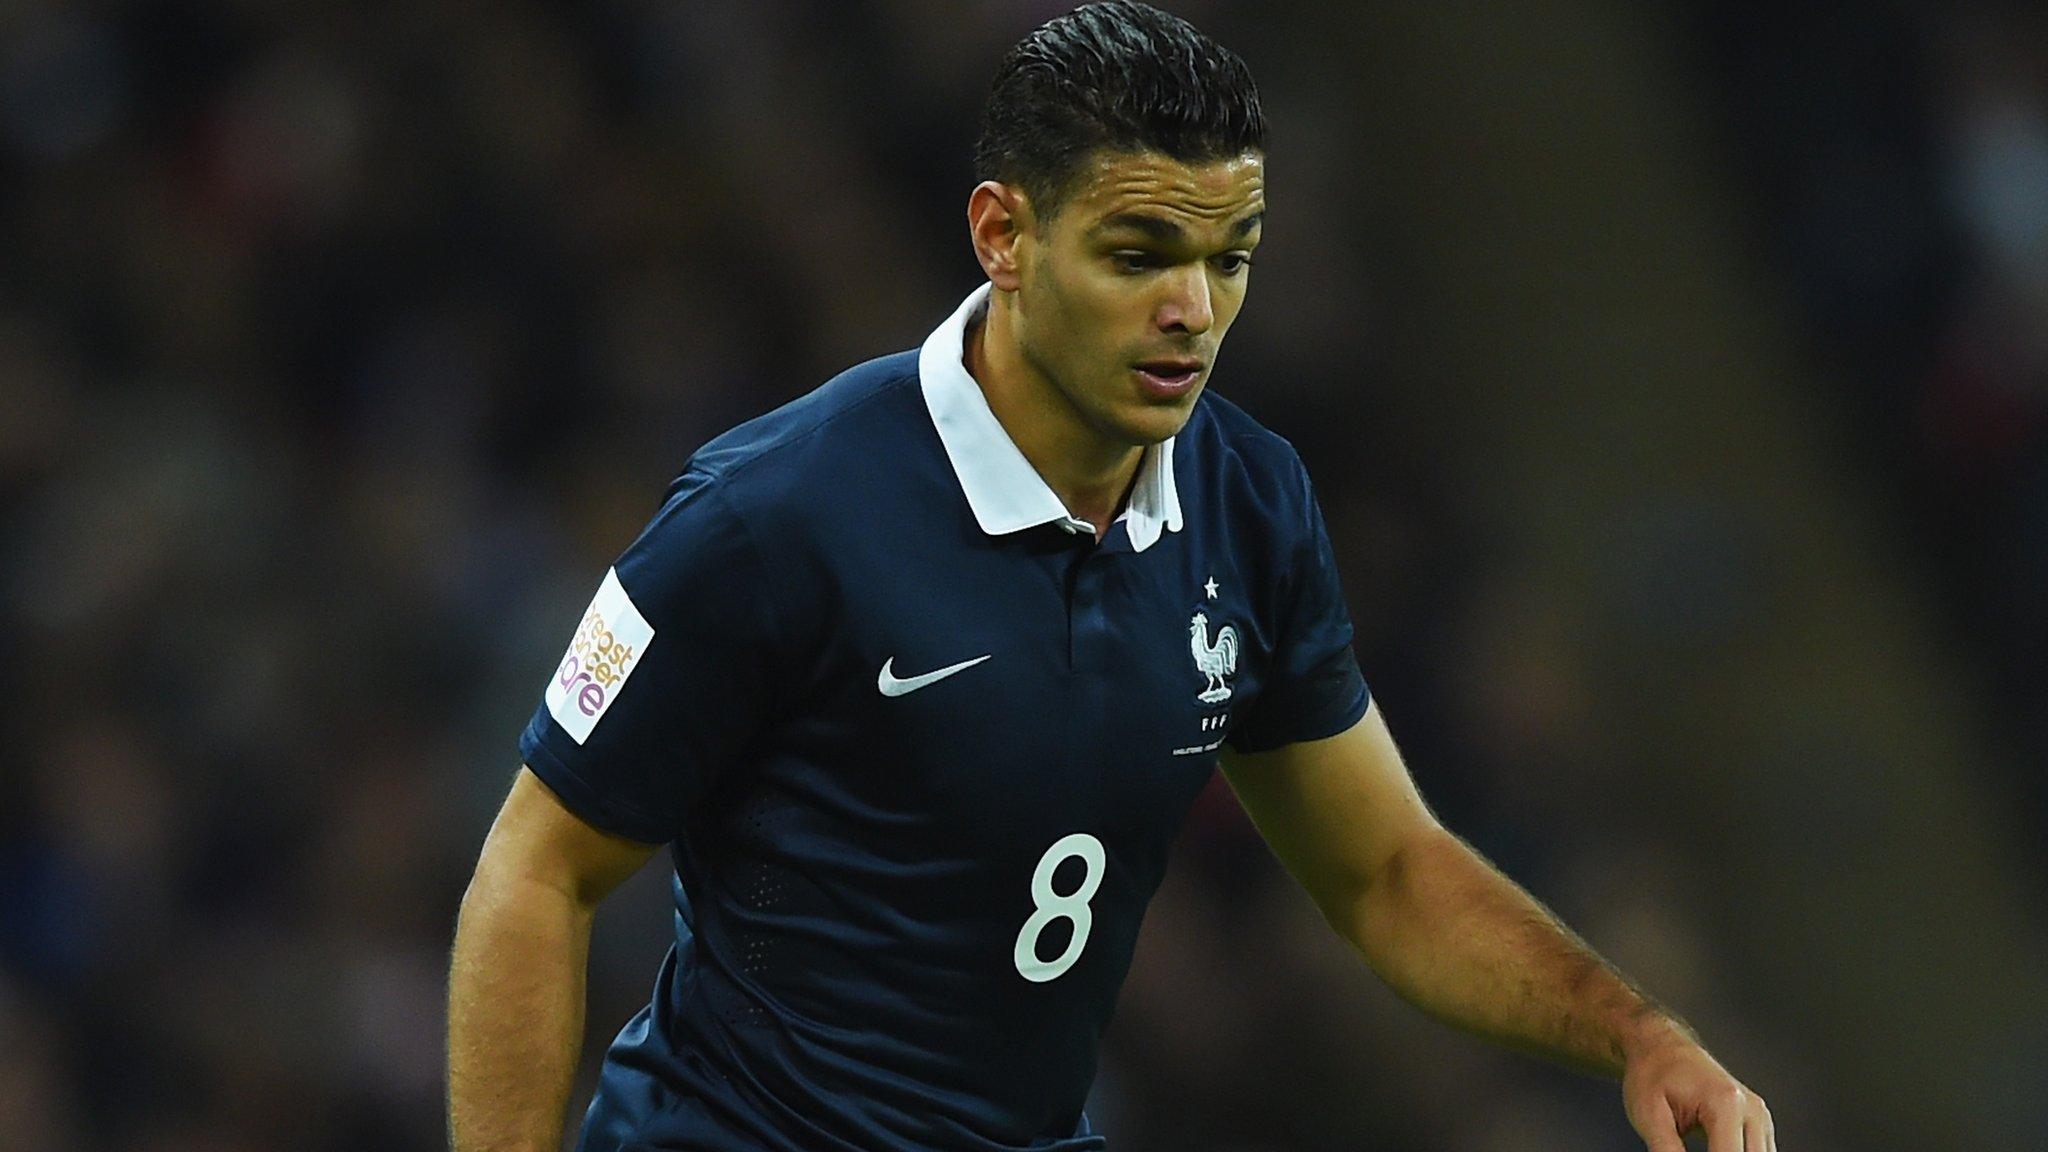 Hatem Ben Arfa: Former Newcastle United forward signs for PSG